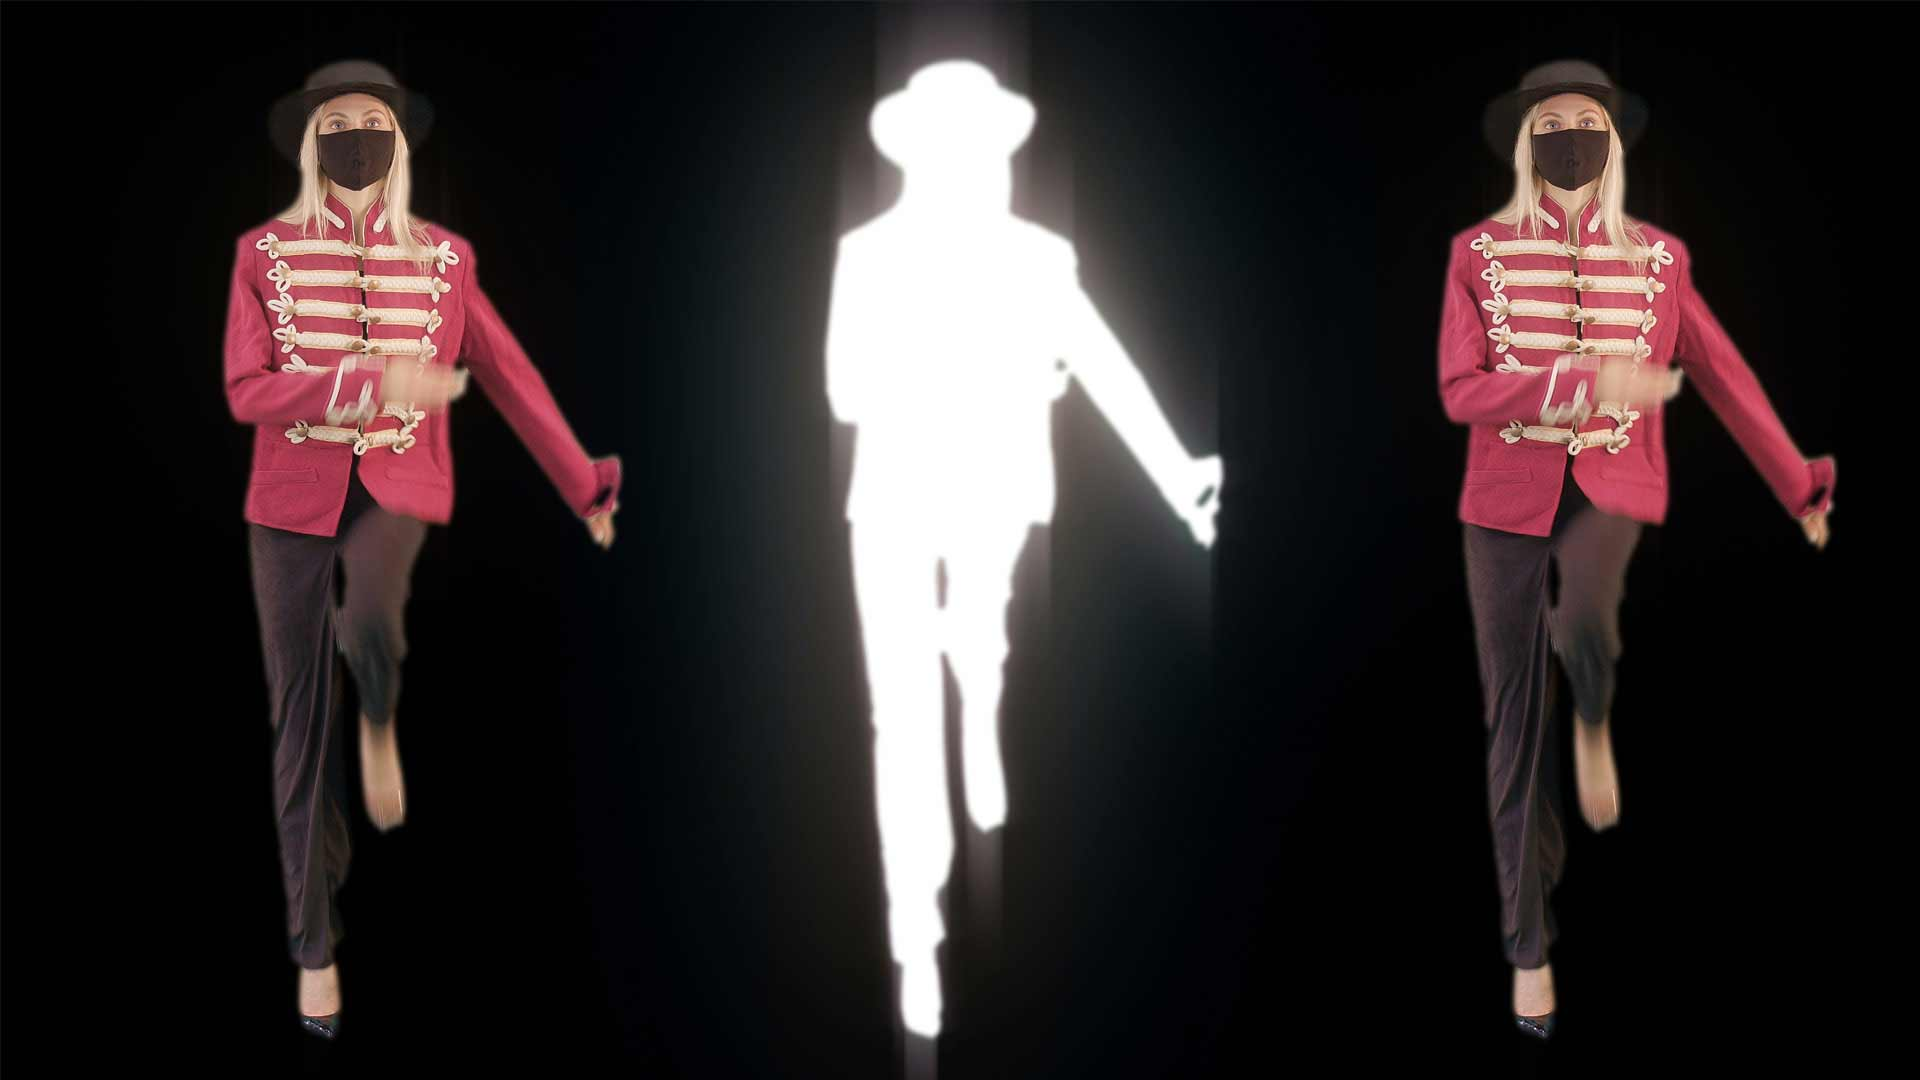 covid 19 video footage marching woman Corona Virus